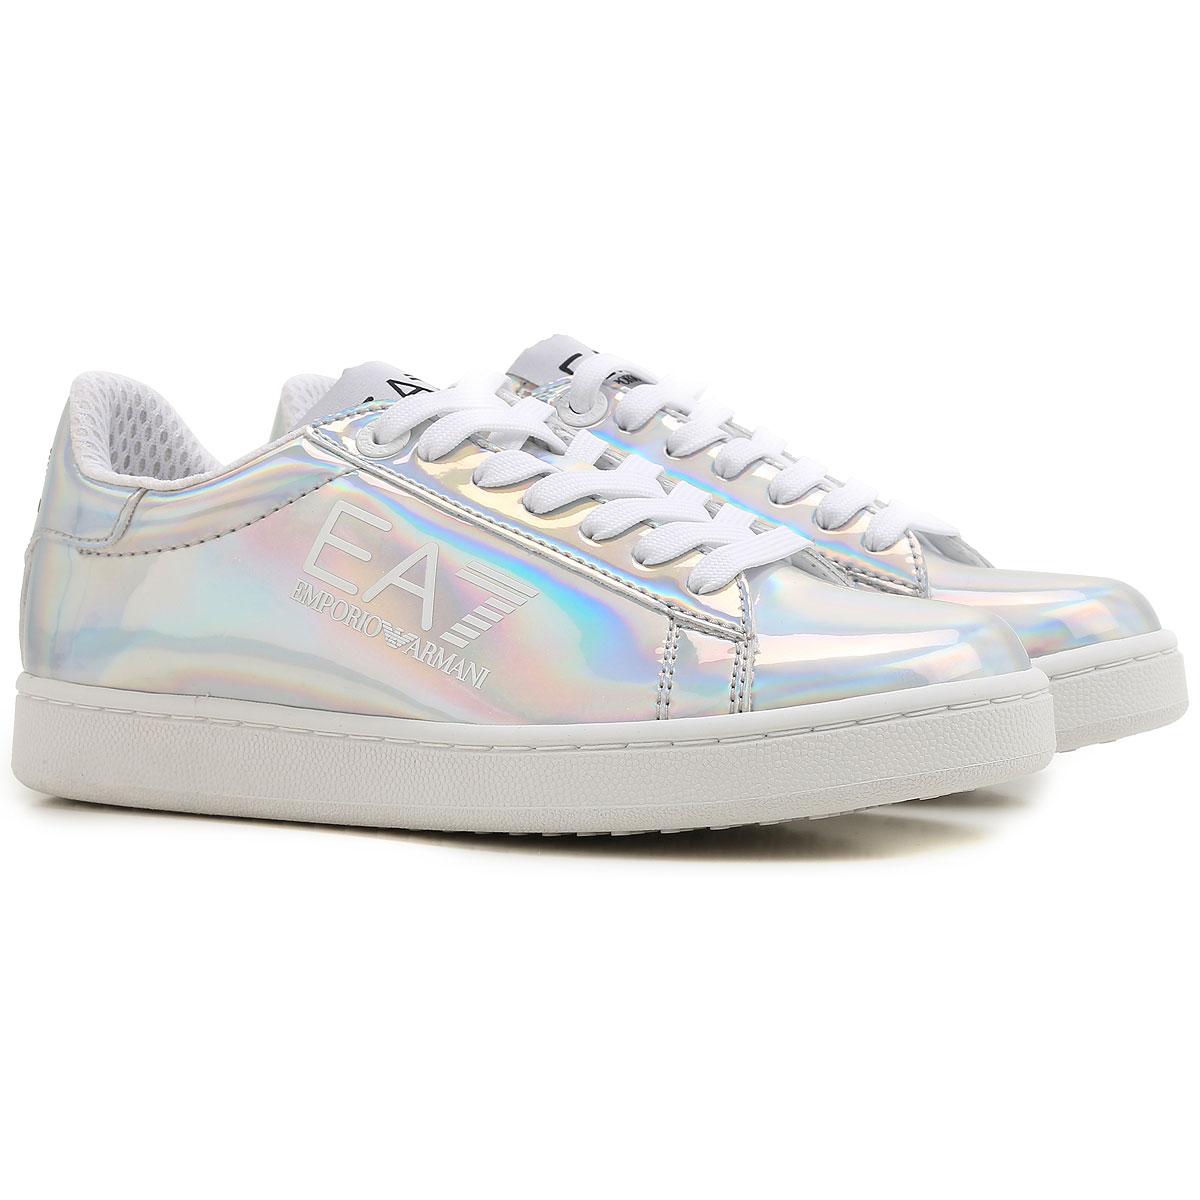 Womens Shoes Emporio Armani Style code 2780797p29909317 405798